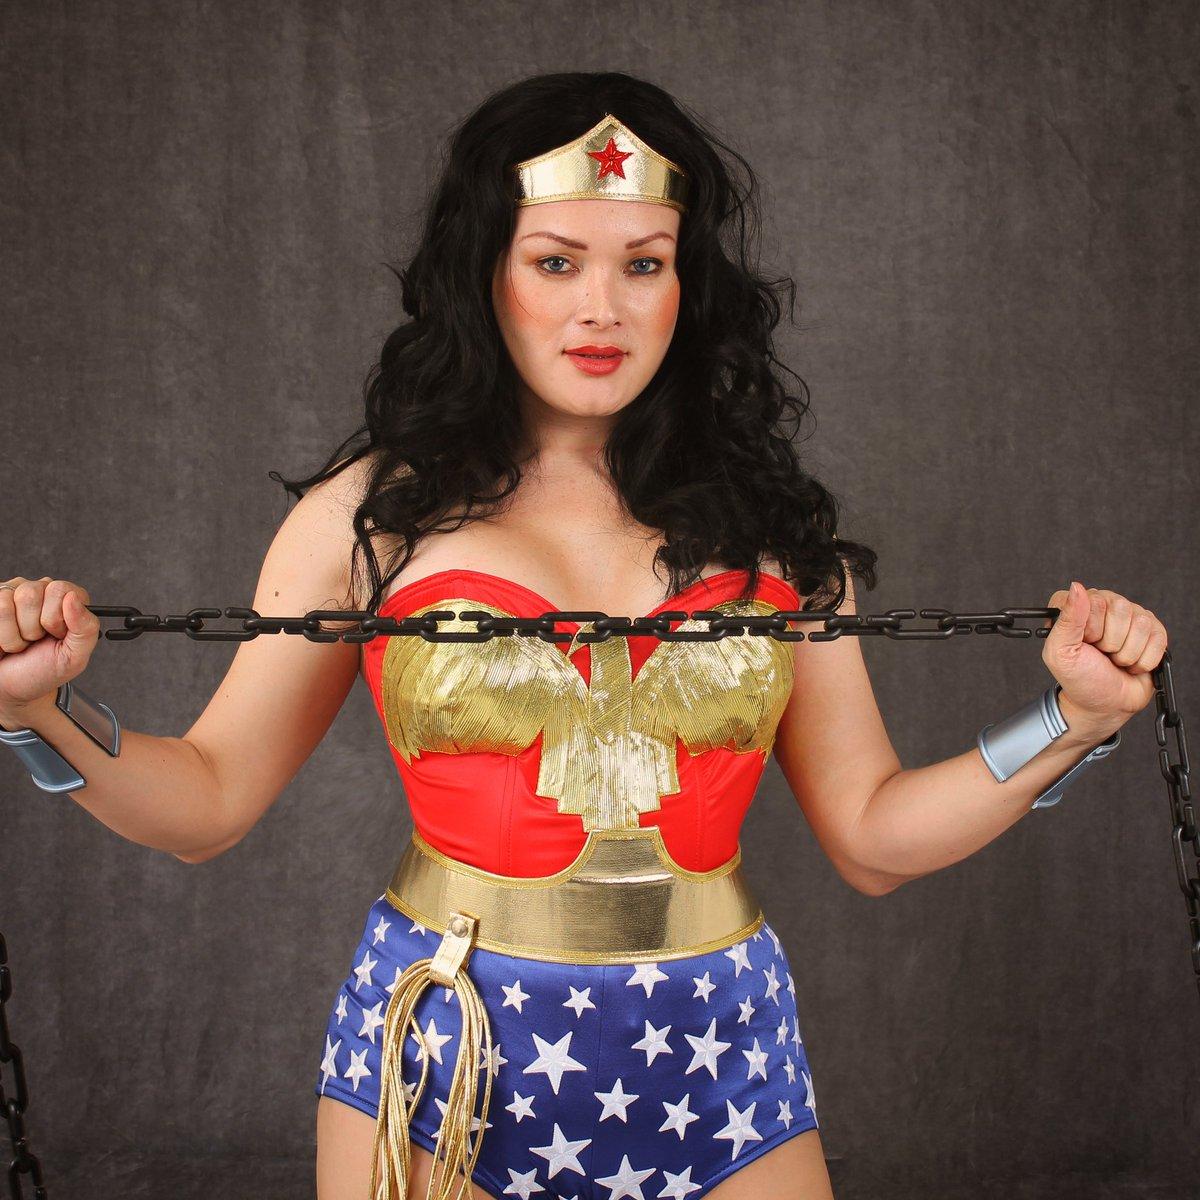 Wonder Woman  PH @luismoraph @RealLyndaCarter #wonderwoman #lyndacarter #mujermaravilla #mulhermaravilha #wonderwomancosplay #cosplayer #inspiration #wonderwoman84 #lindacarter #cosplay #dccomics #galgadot #dccosplay #powerfullpic.twitter.com/T0ETd7h9lV